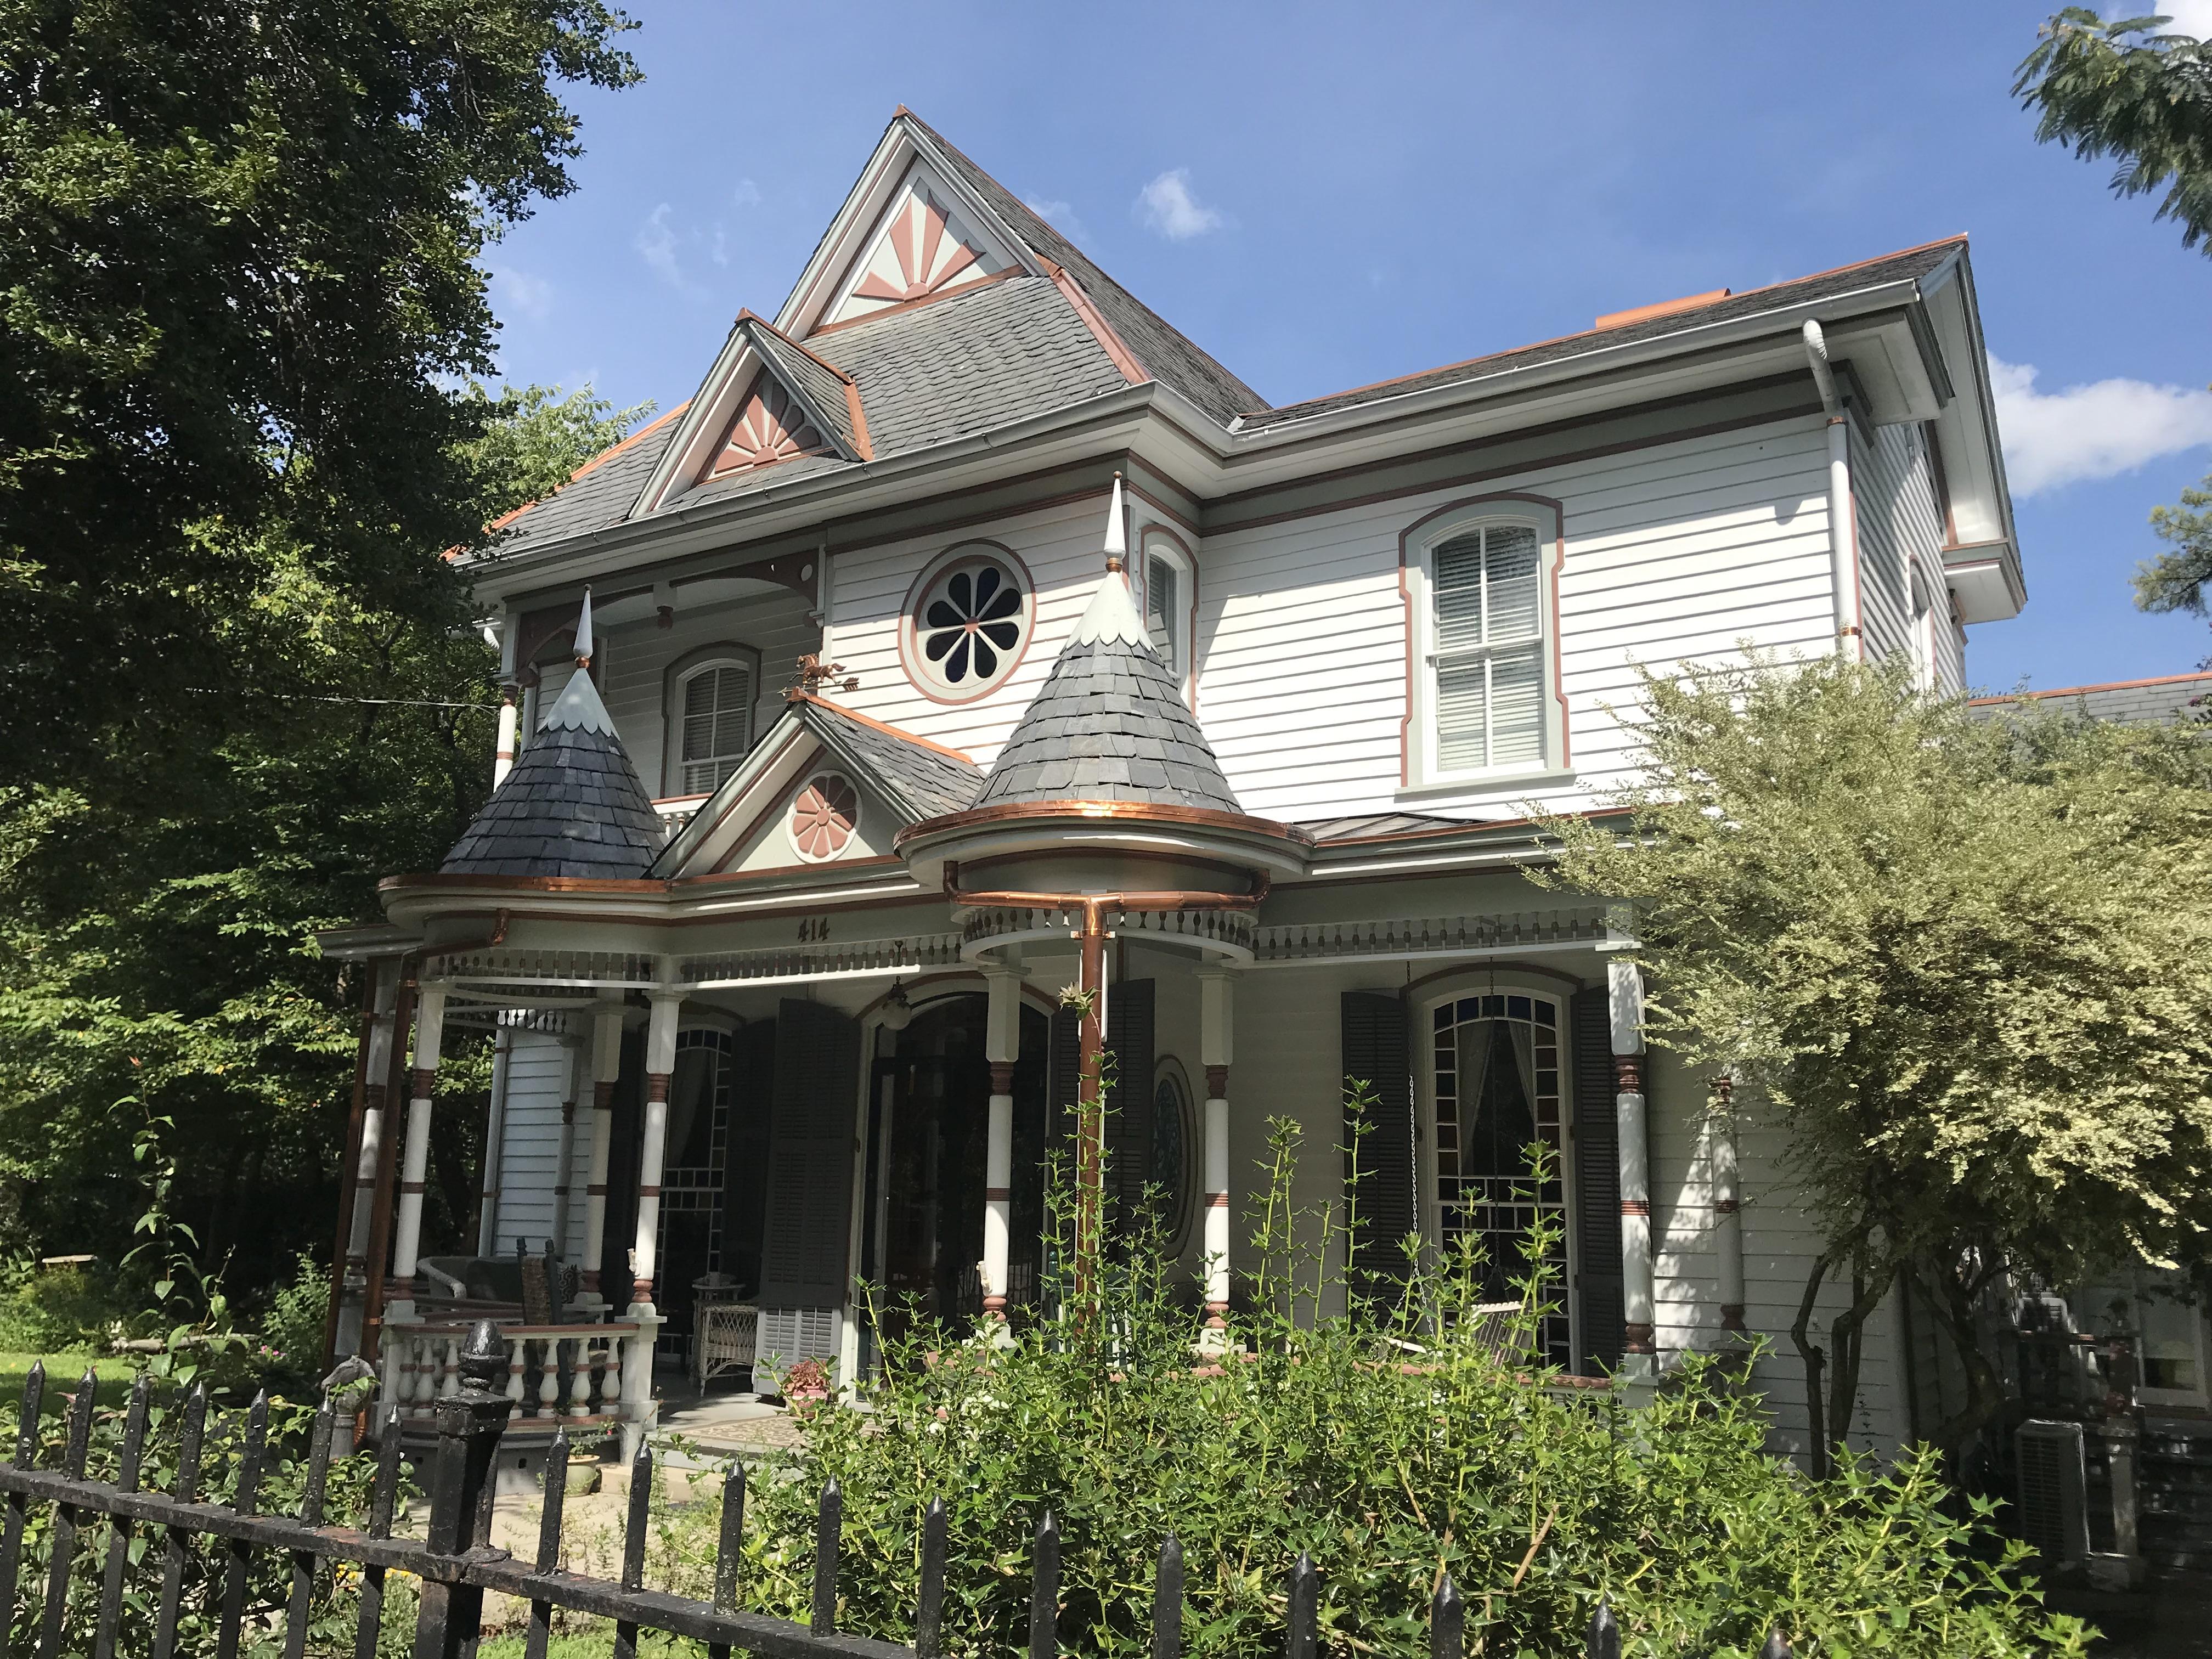 James Norfleet Stronach Jr Norma Tomb A To Z Home Improvement